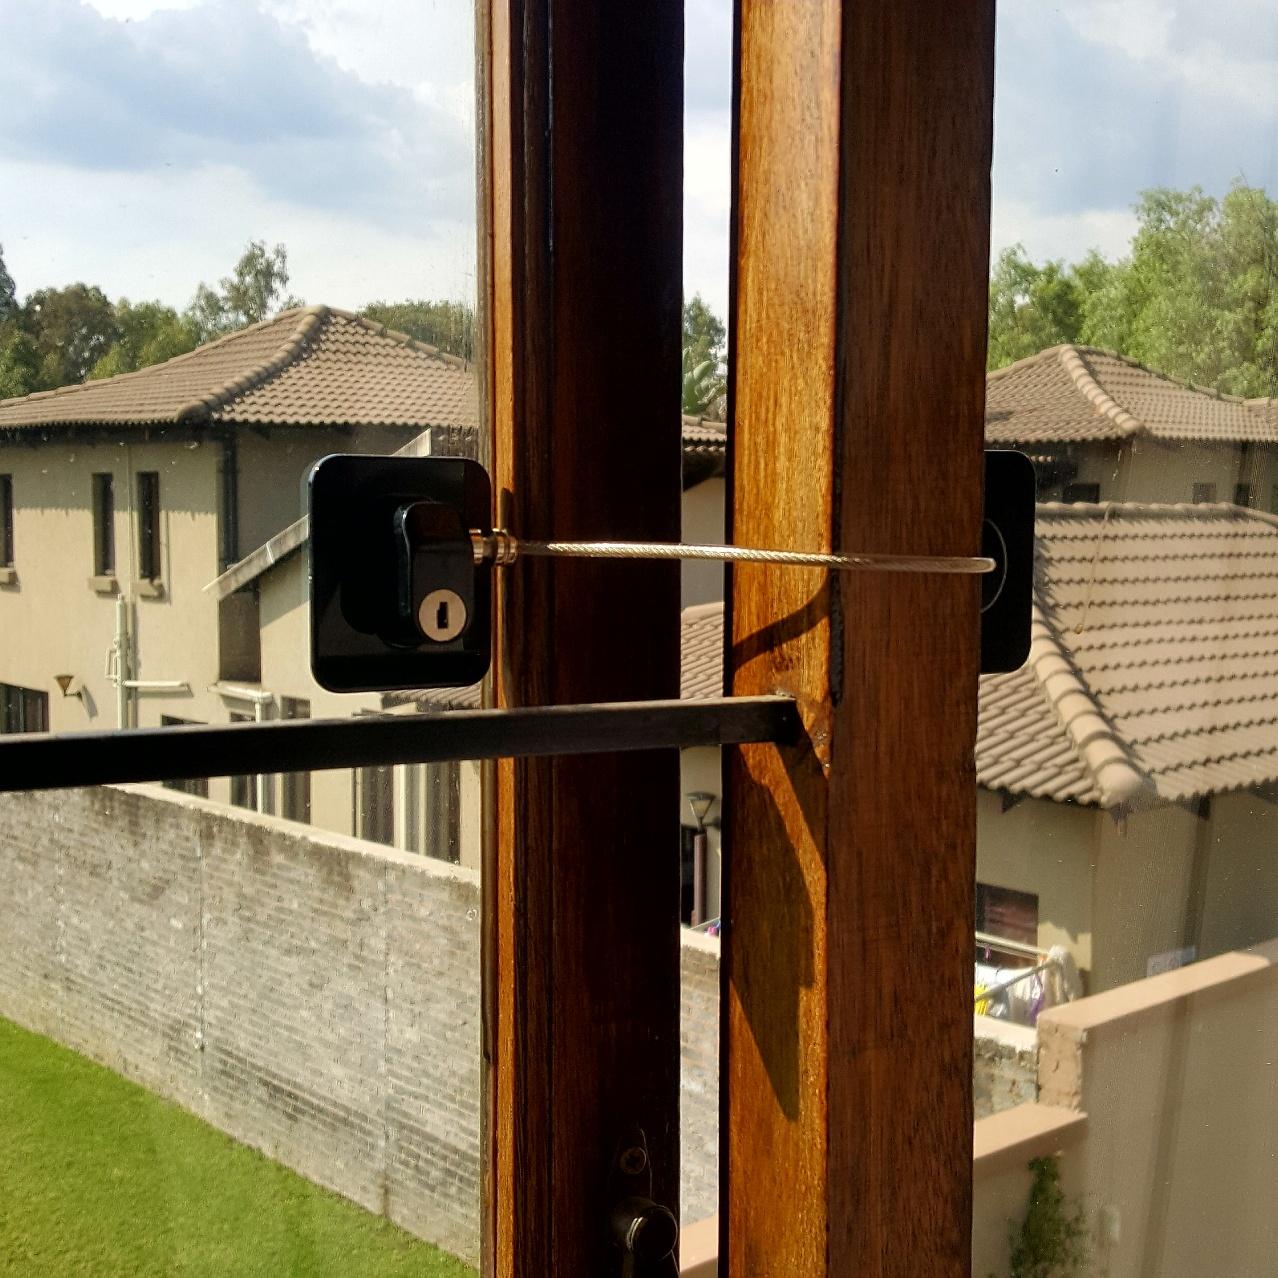 self-adhesive-window-lock-black-south-africa